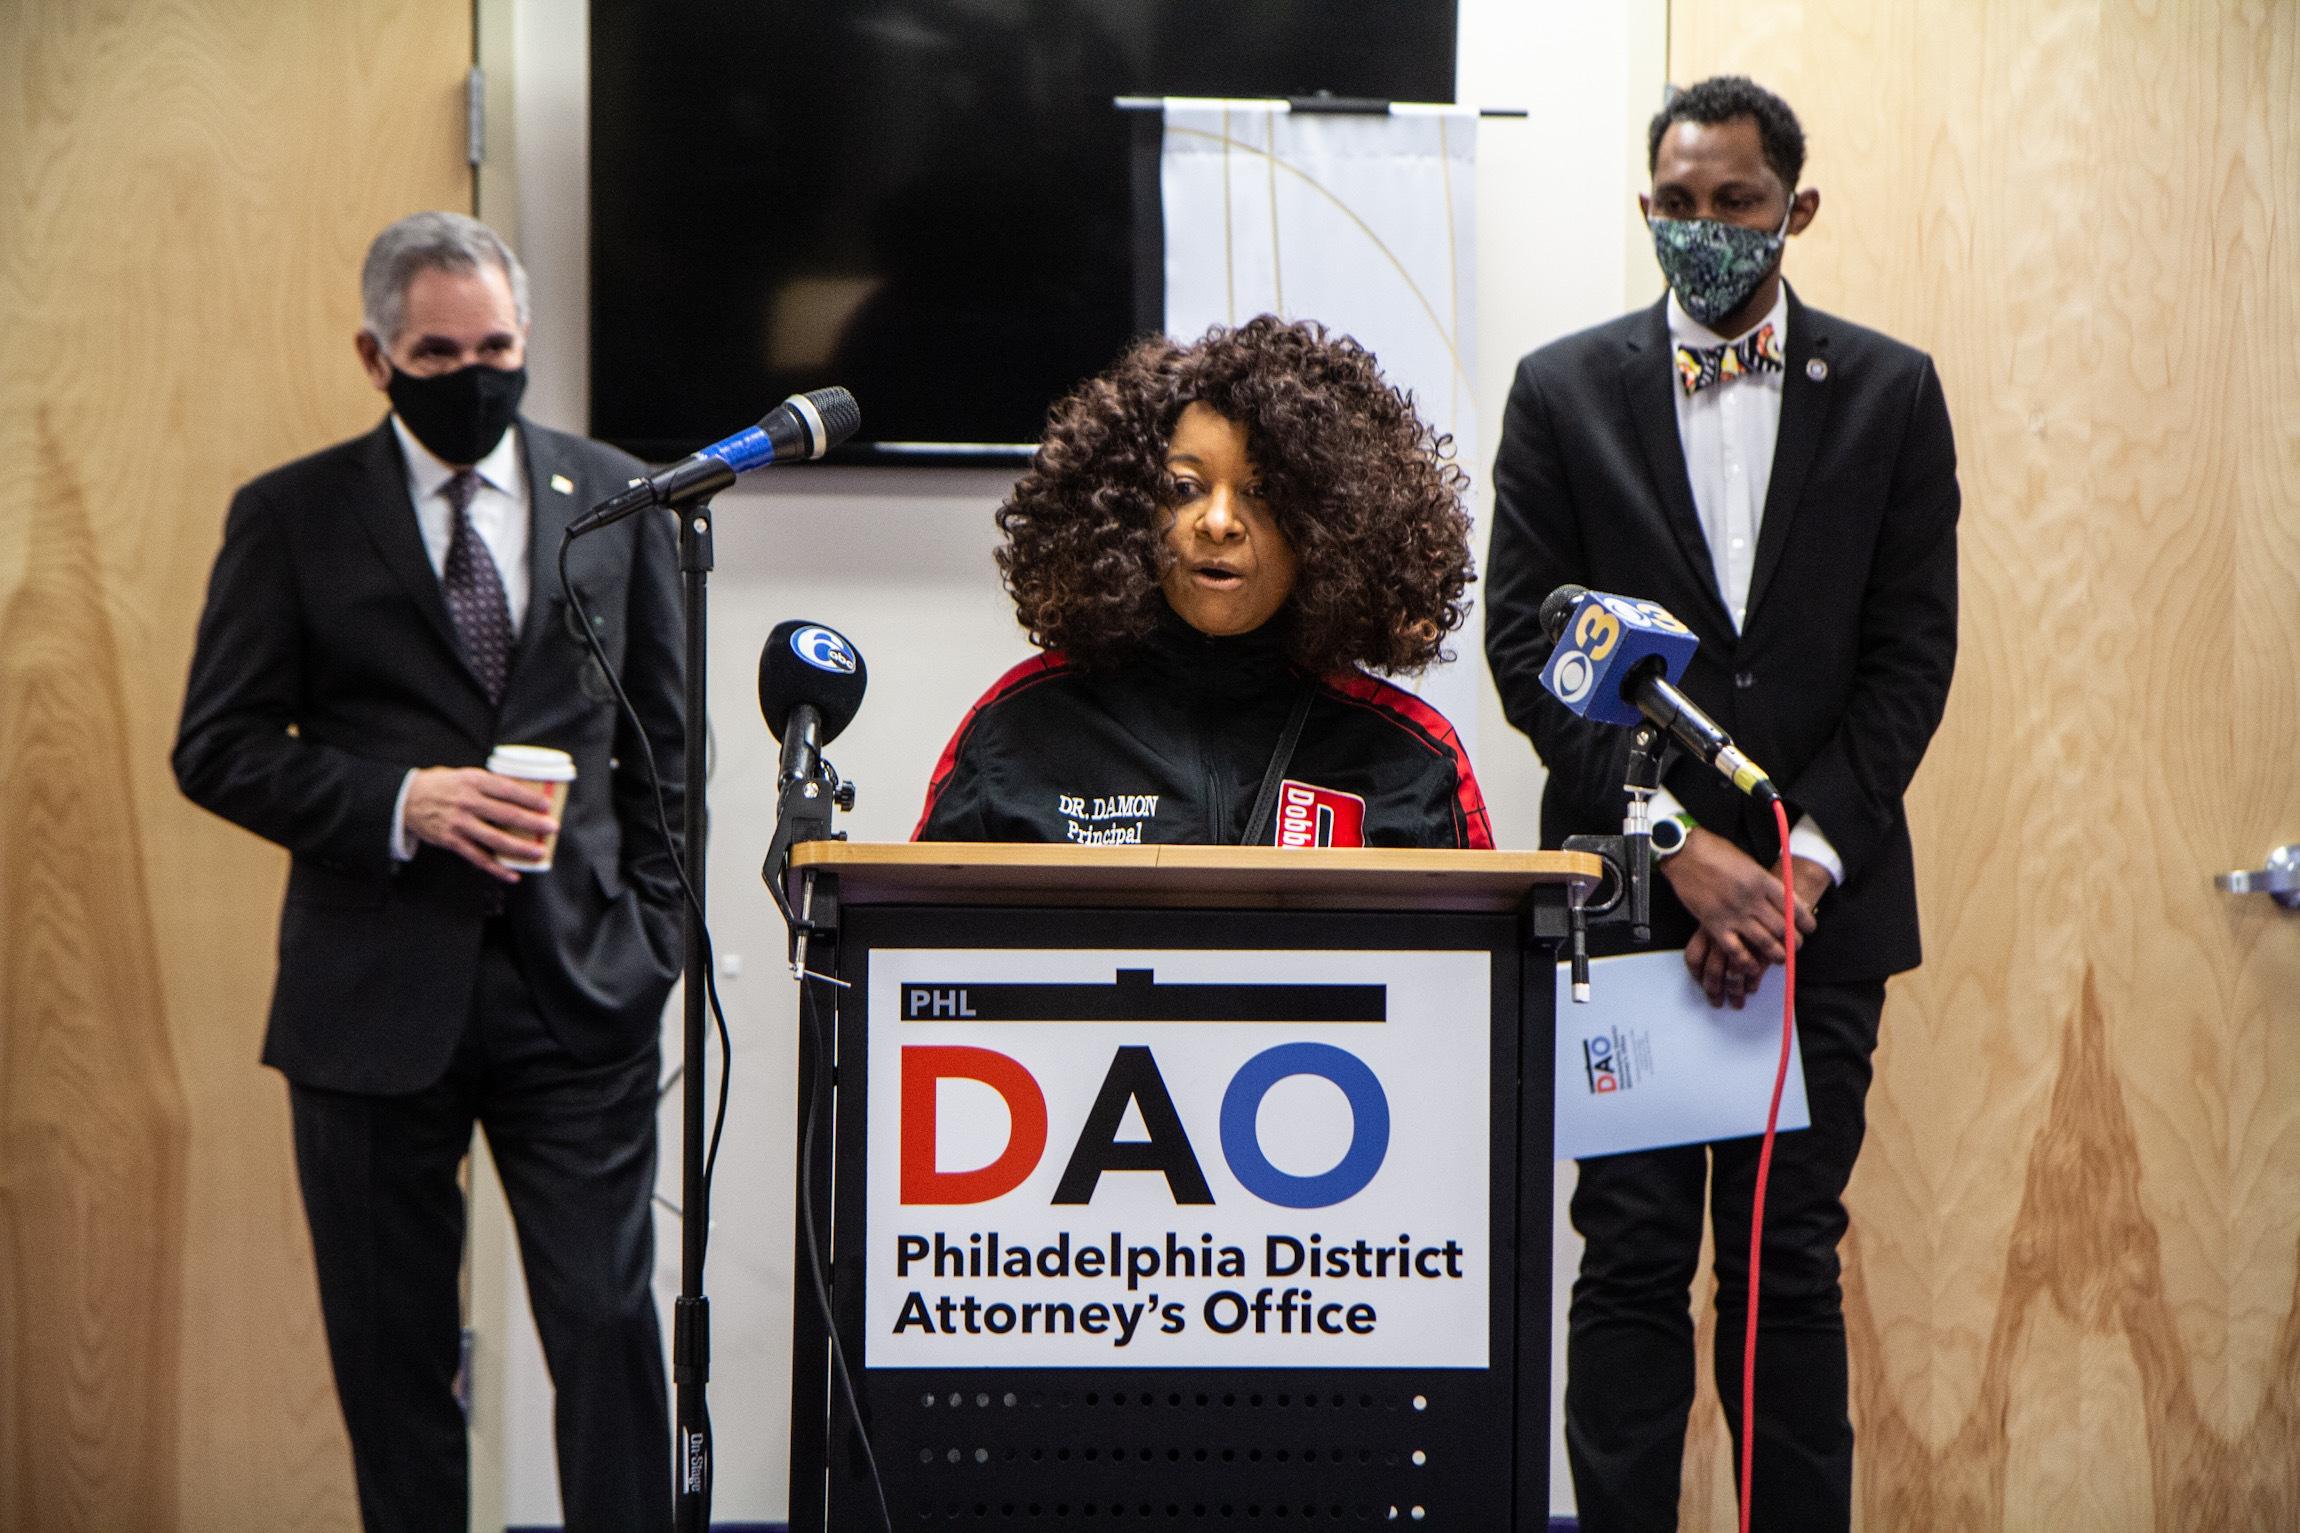 Toni Damon addresses the media at a DAO press conference